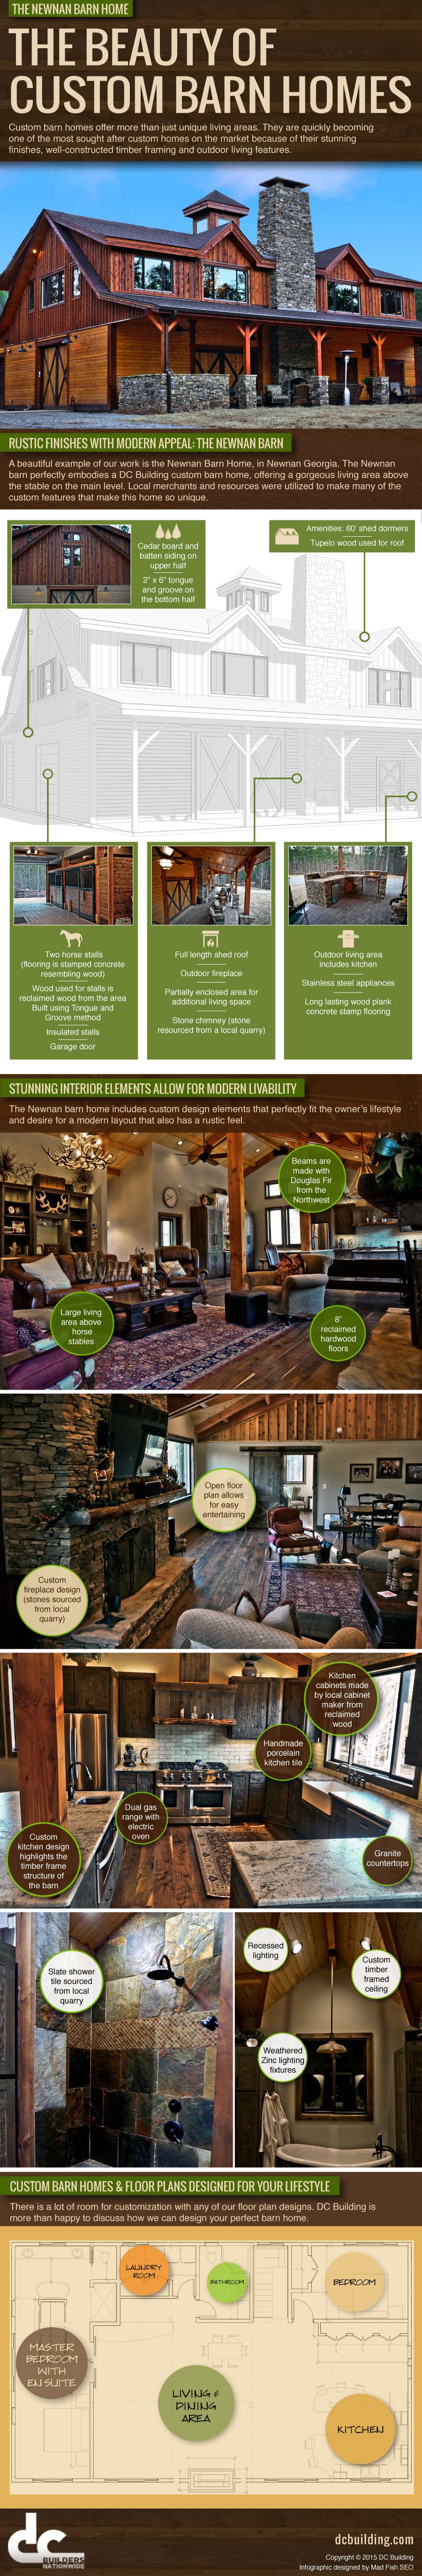 The Beauty of Custom Barn Homes